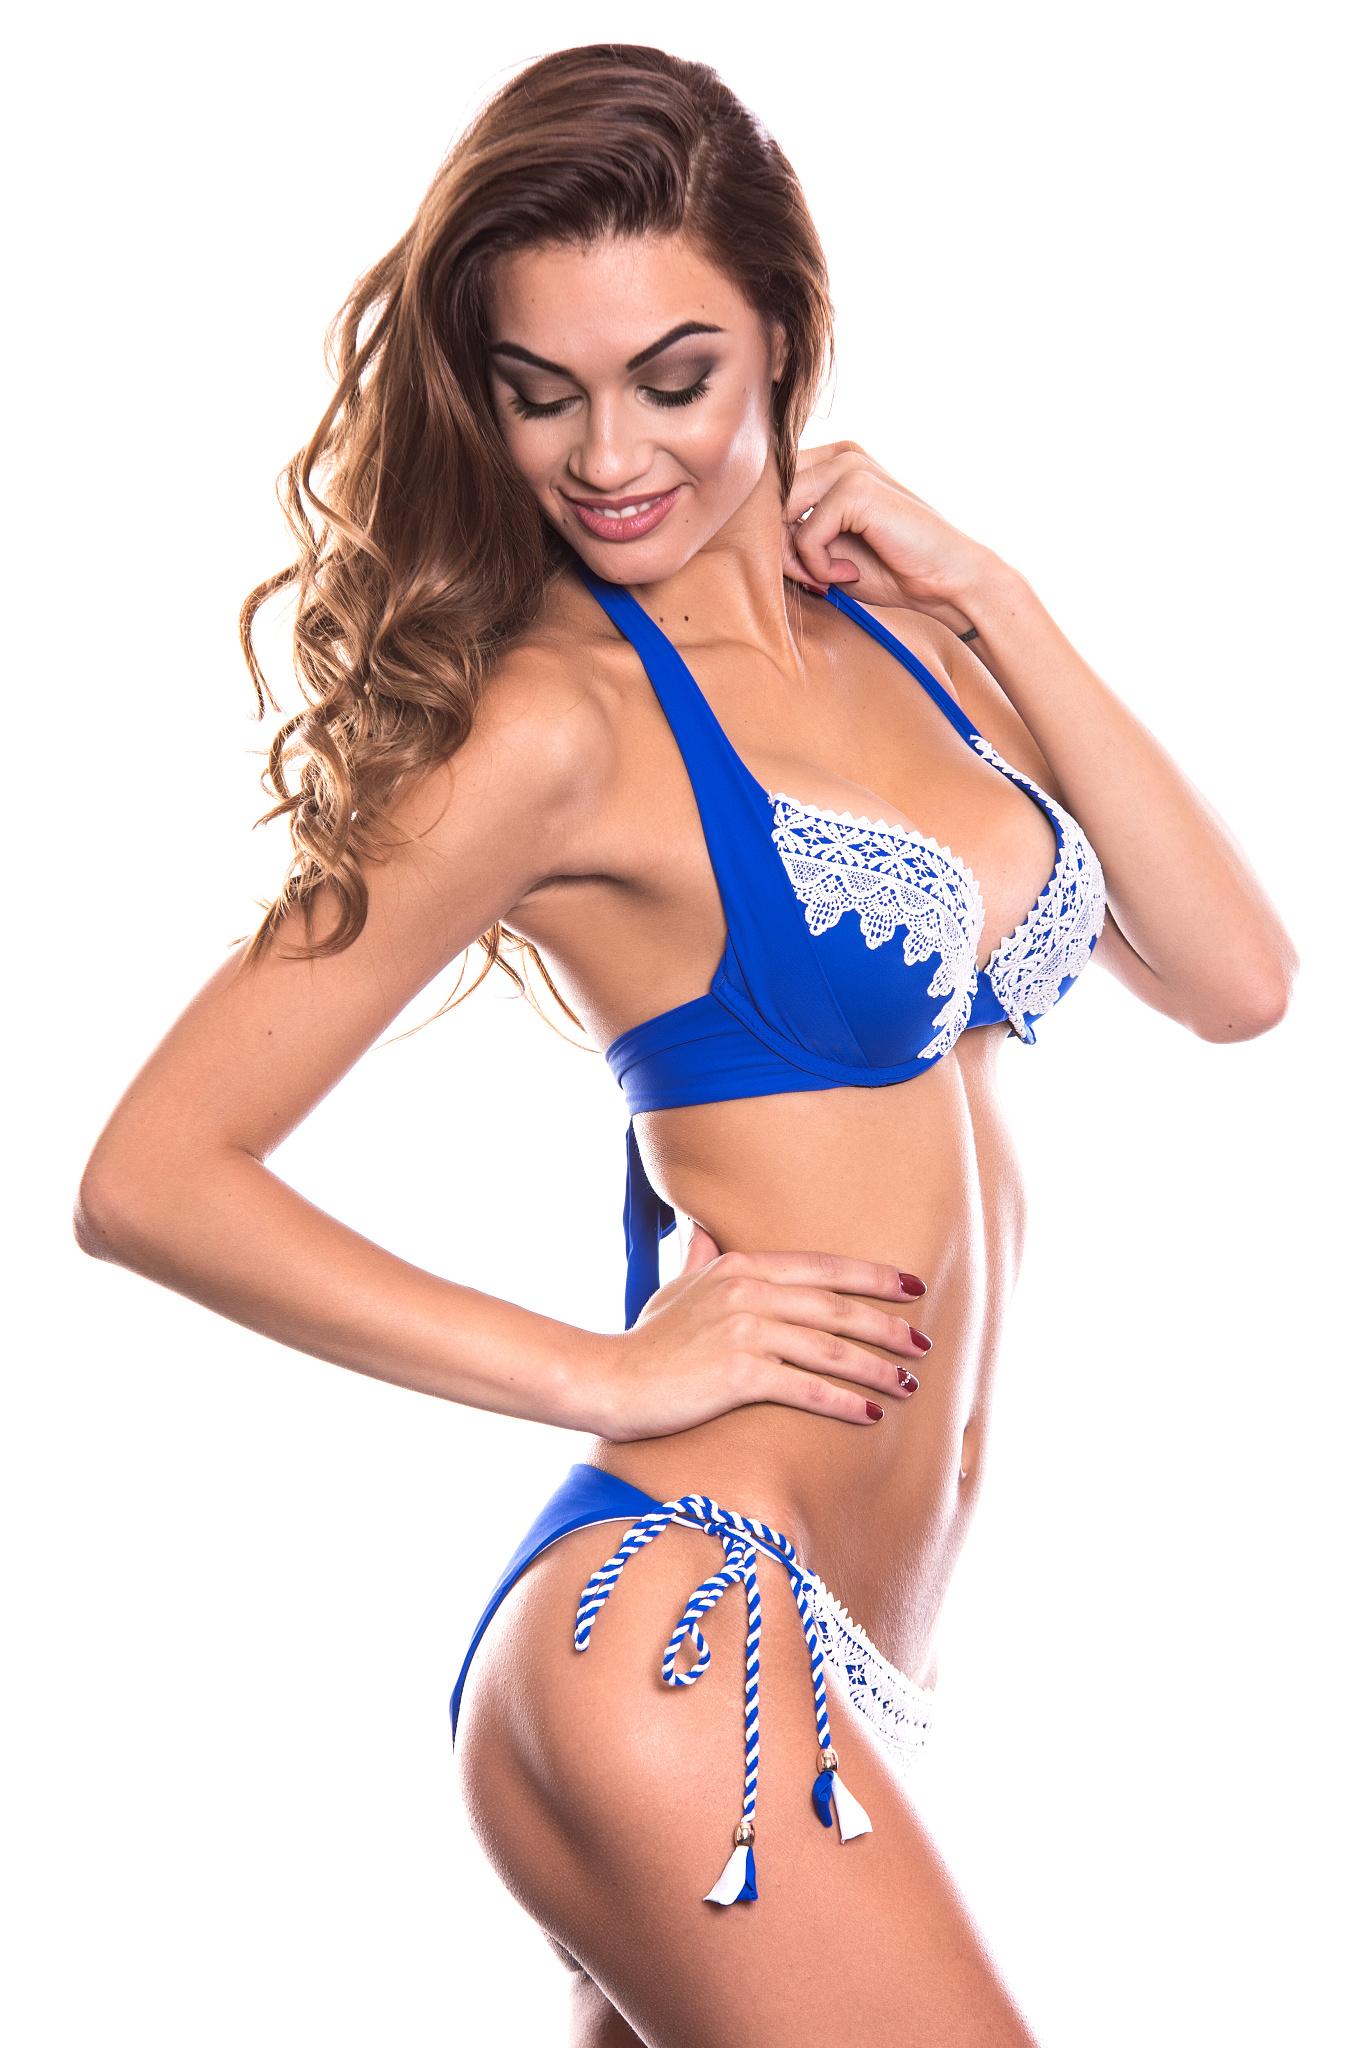 ... Spitze Volk Royal Blau ‹Return to Previous Page. Bug Fix Sale! 22. RELLECIGA  Damen Bademode Bügel Bikini mit ... 89ece8f839